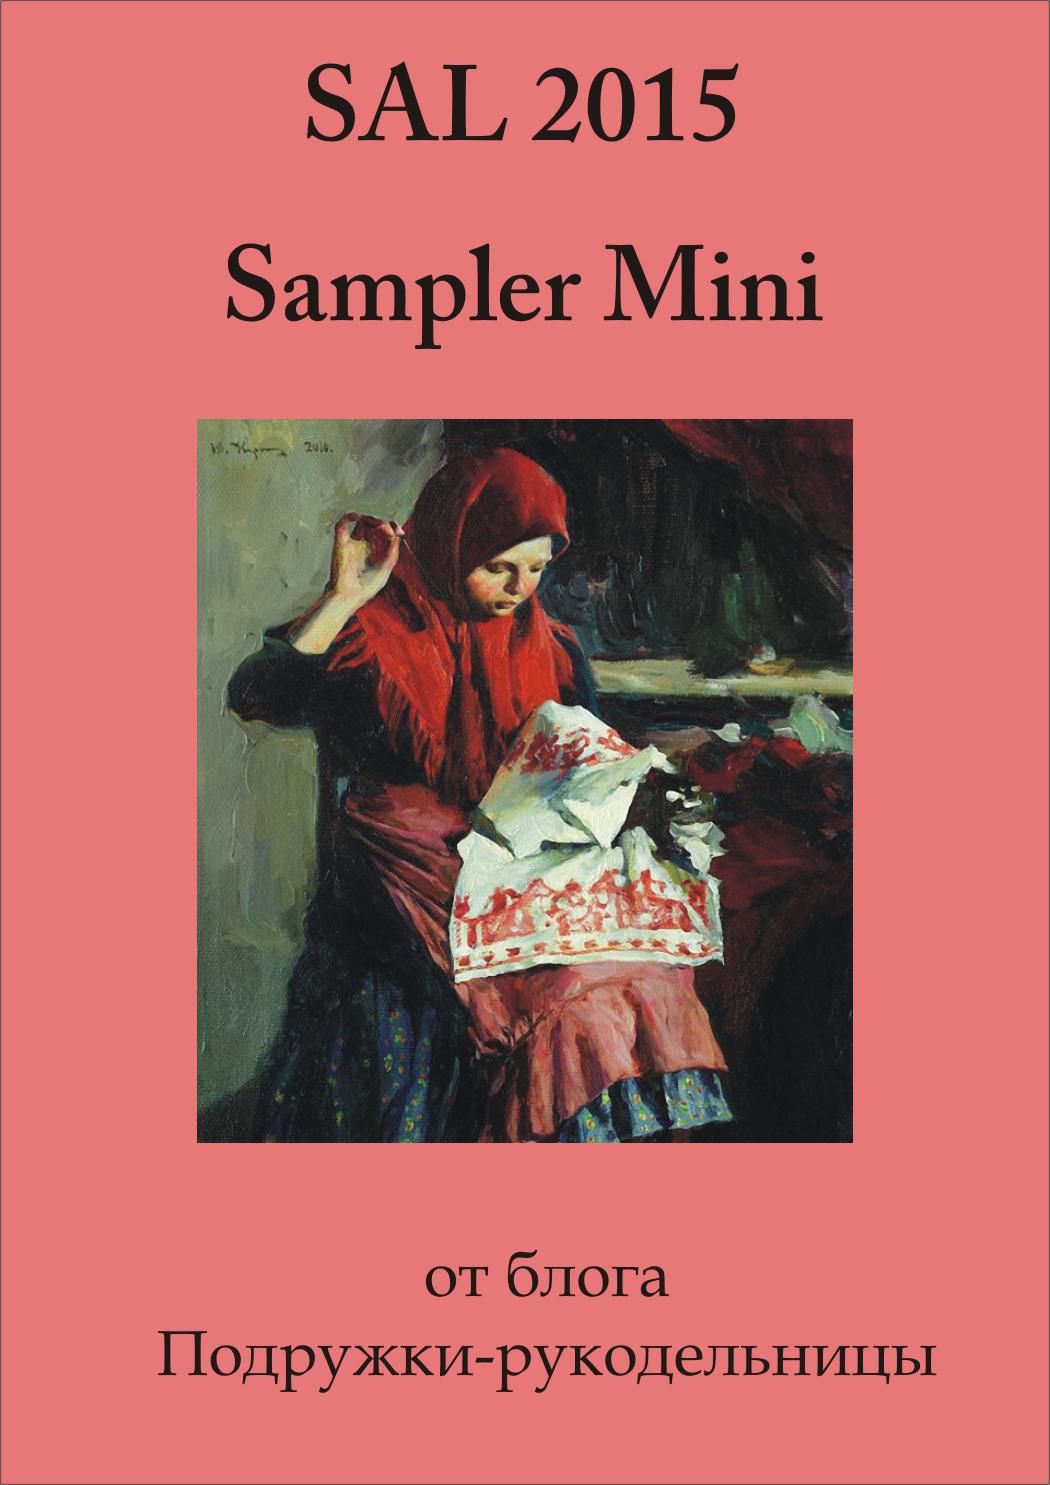 SAL 2015 Sampler Mini